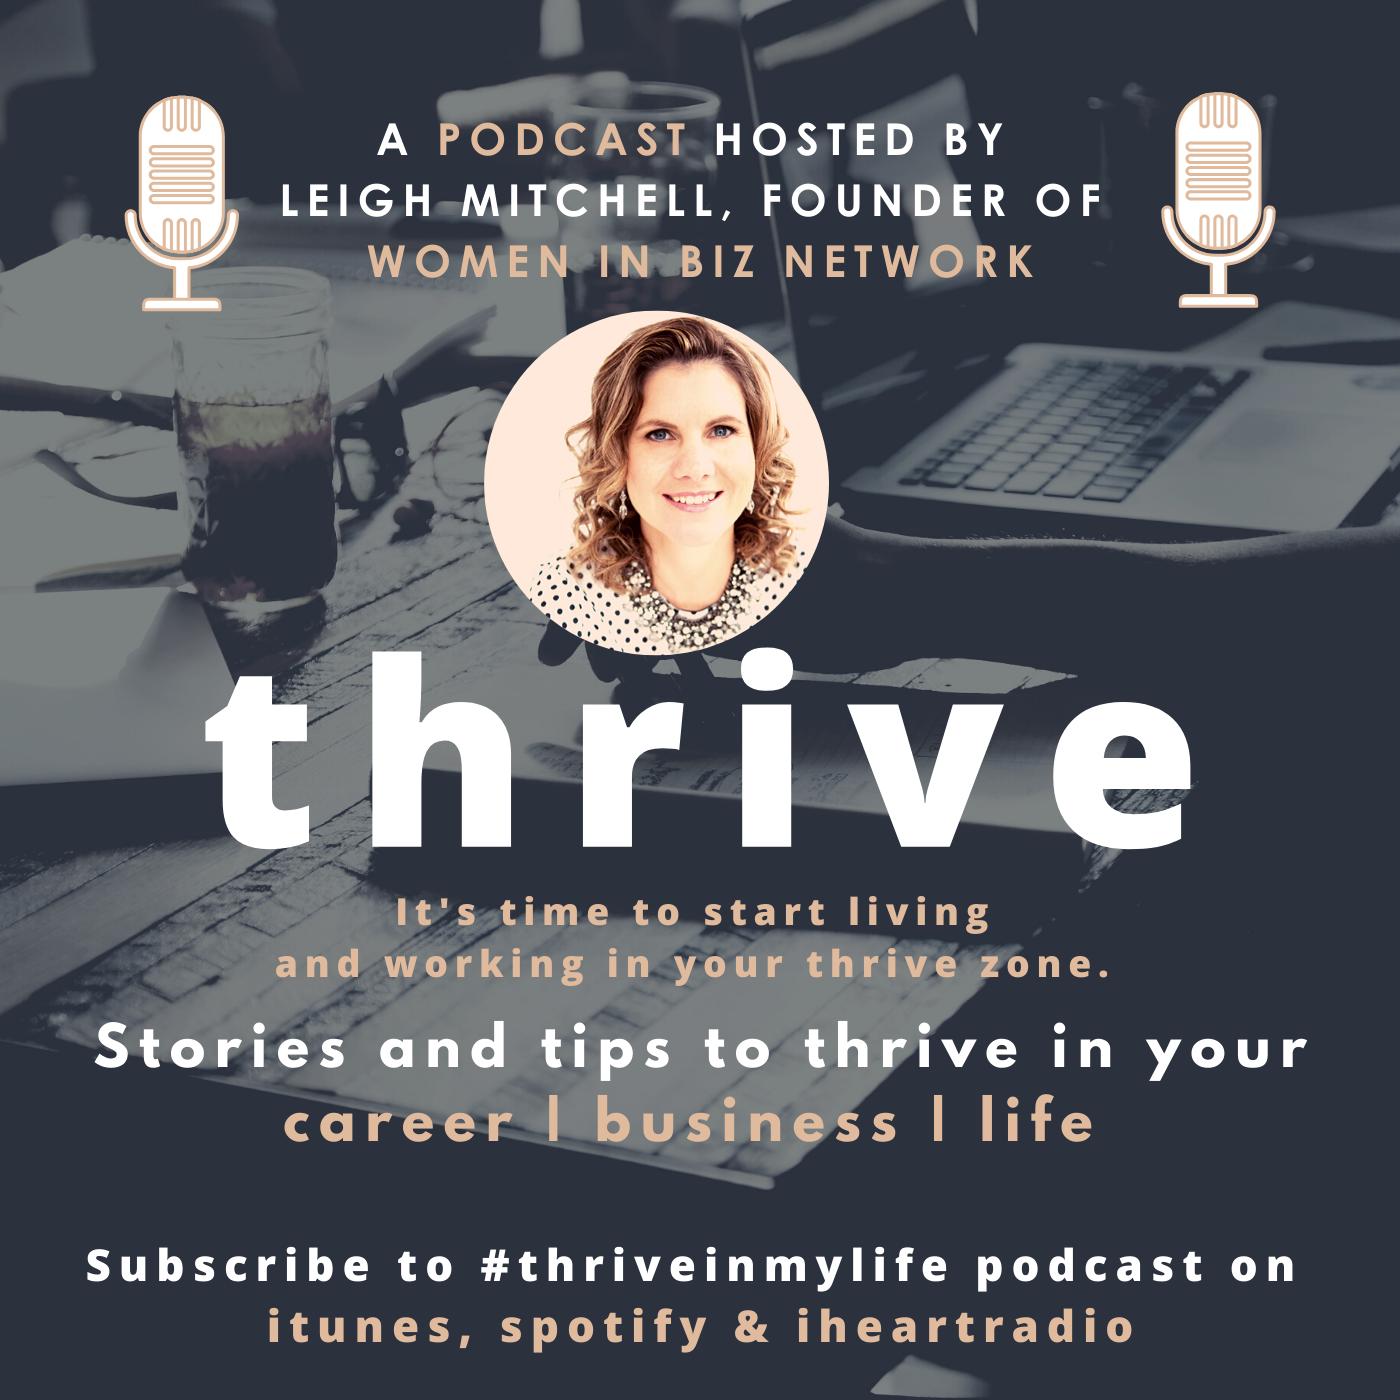 Thrive podcast #Thriveinmylife show art